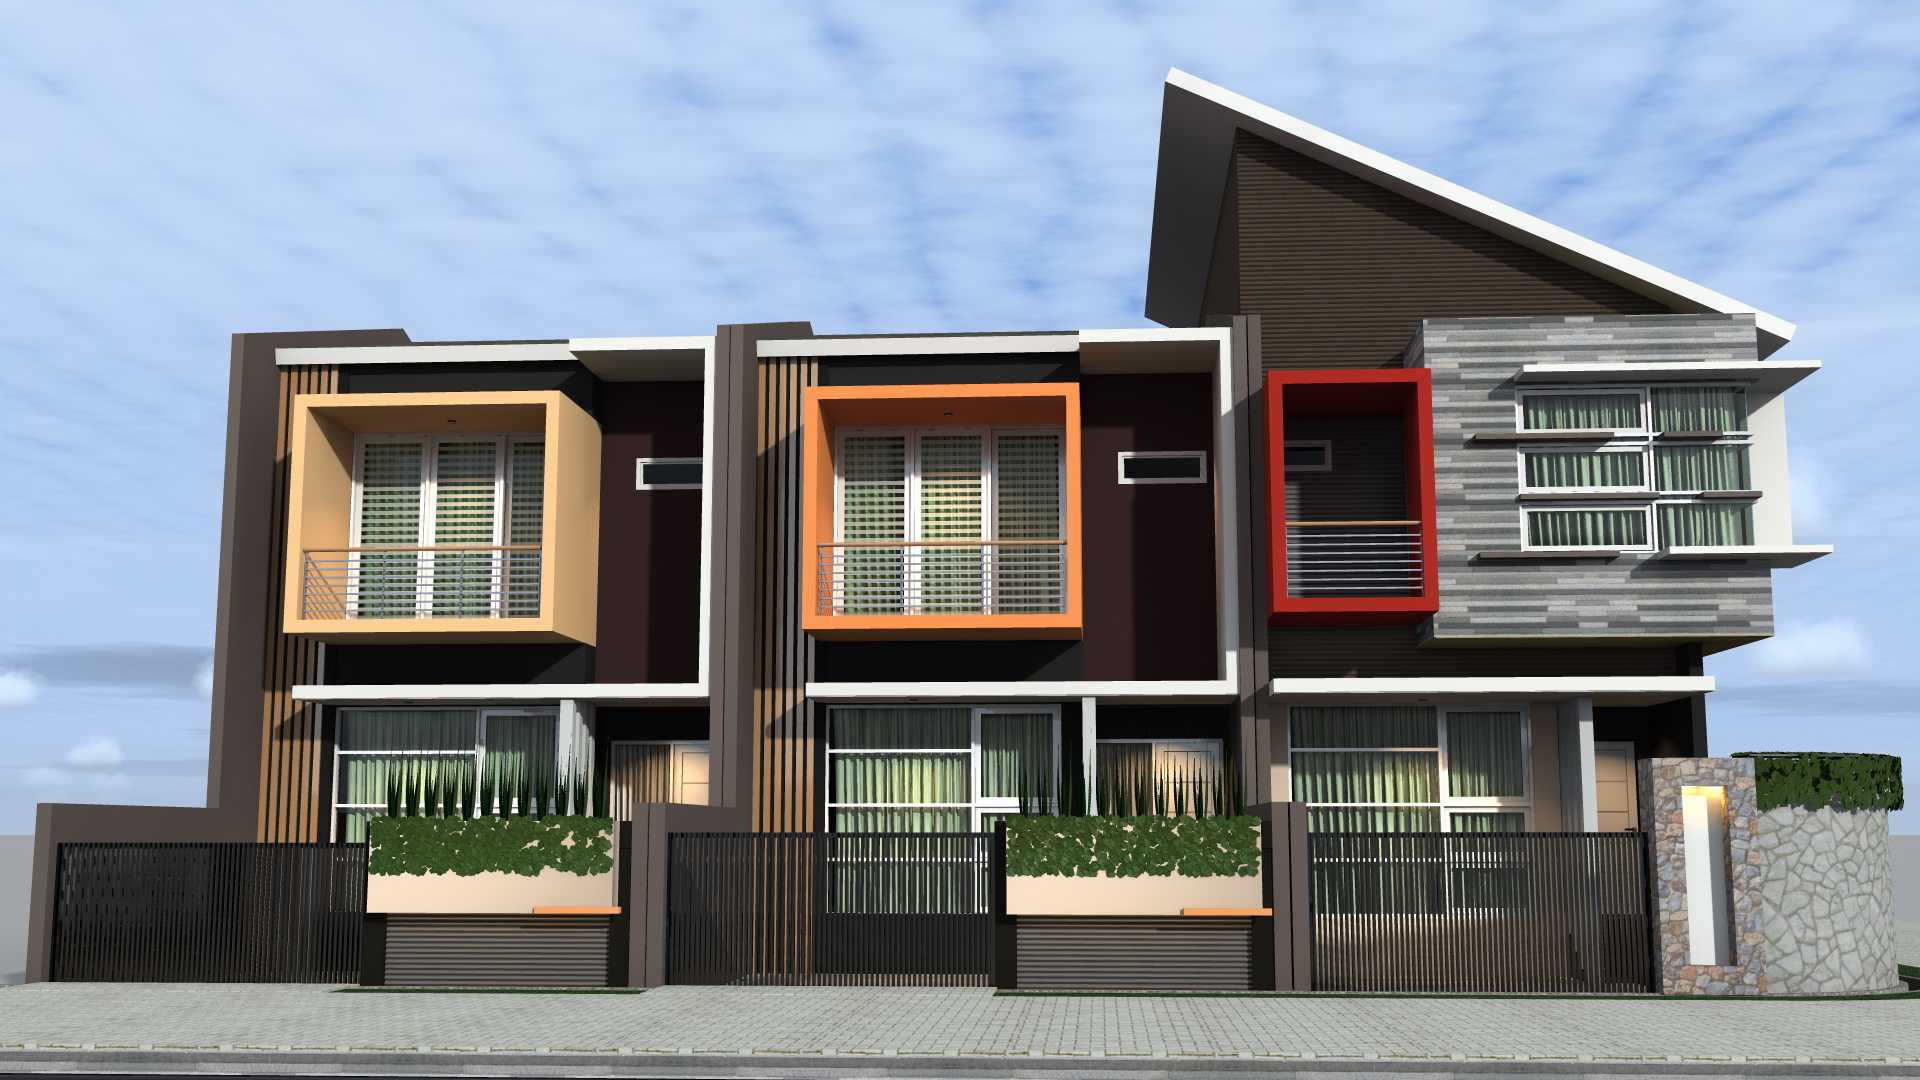 Muh Baumar, S.t Property Perumahan Bandung, Kota Bandung, Jawa Barat, Indonesia Bandung, Kota Bandung, Jawa Barat, Indonesia Muh-Baumar-St-Property-Perumahan   57852